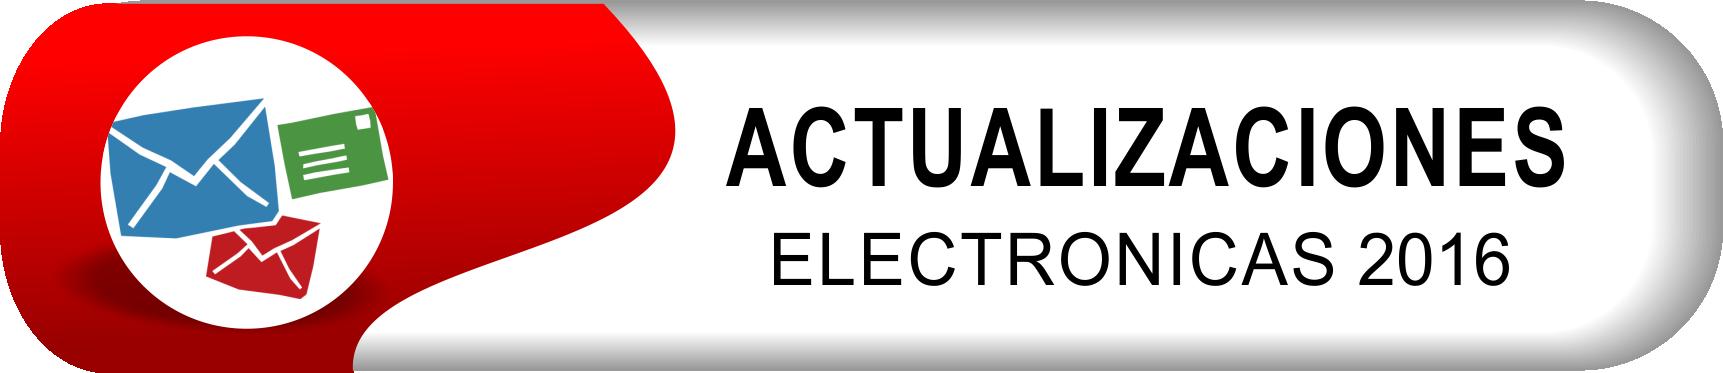 boton actualizac electr16.png